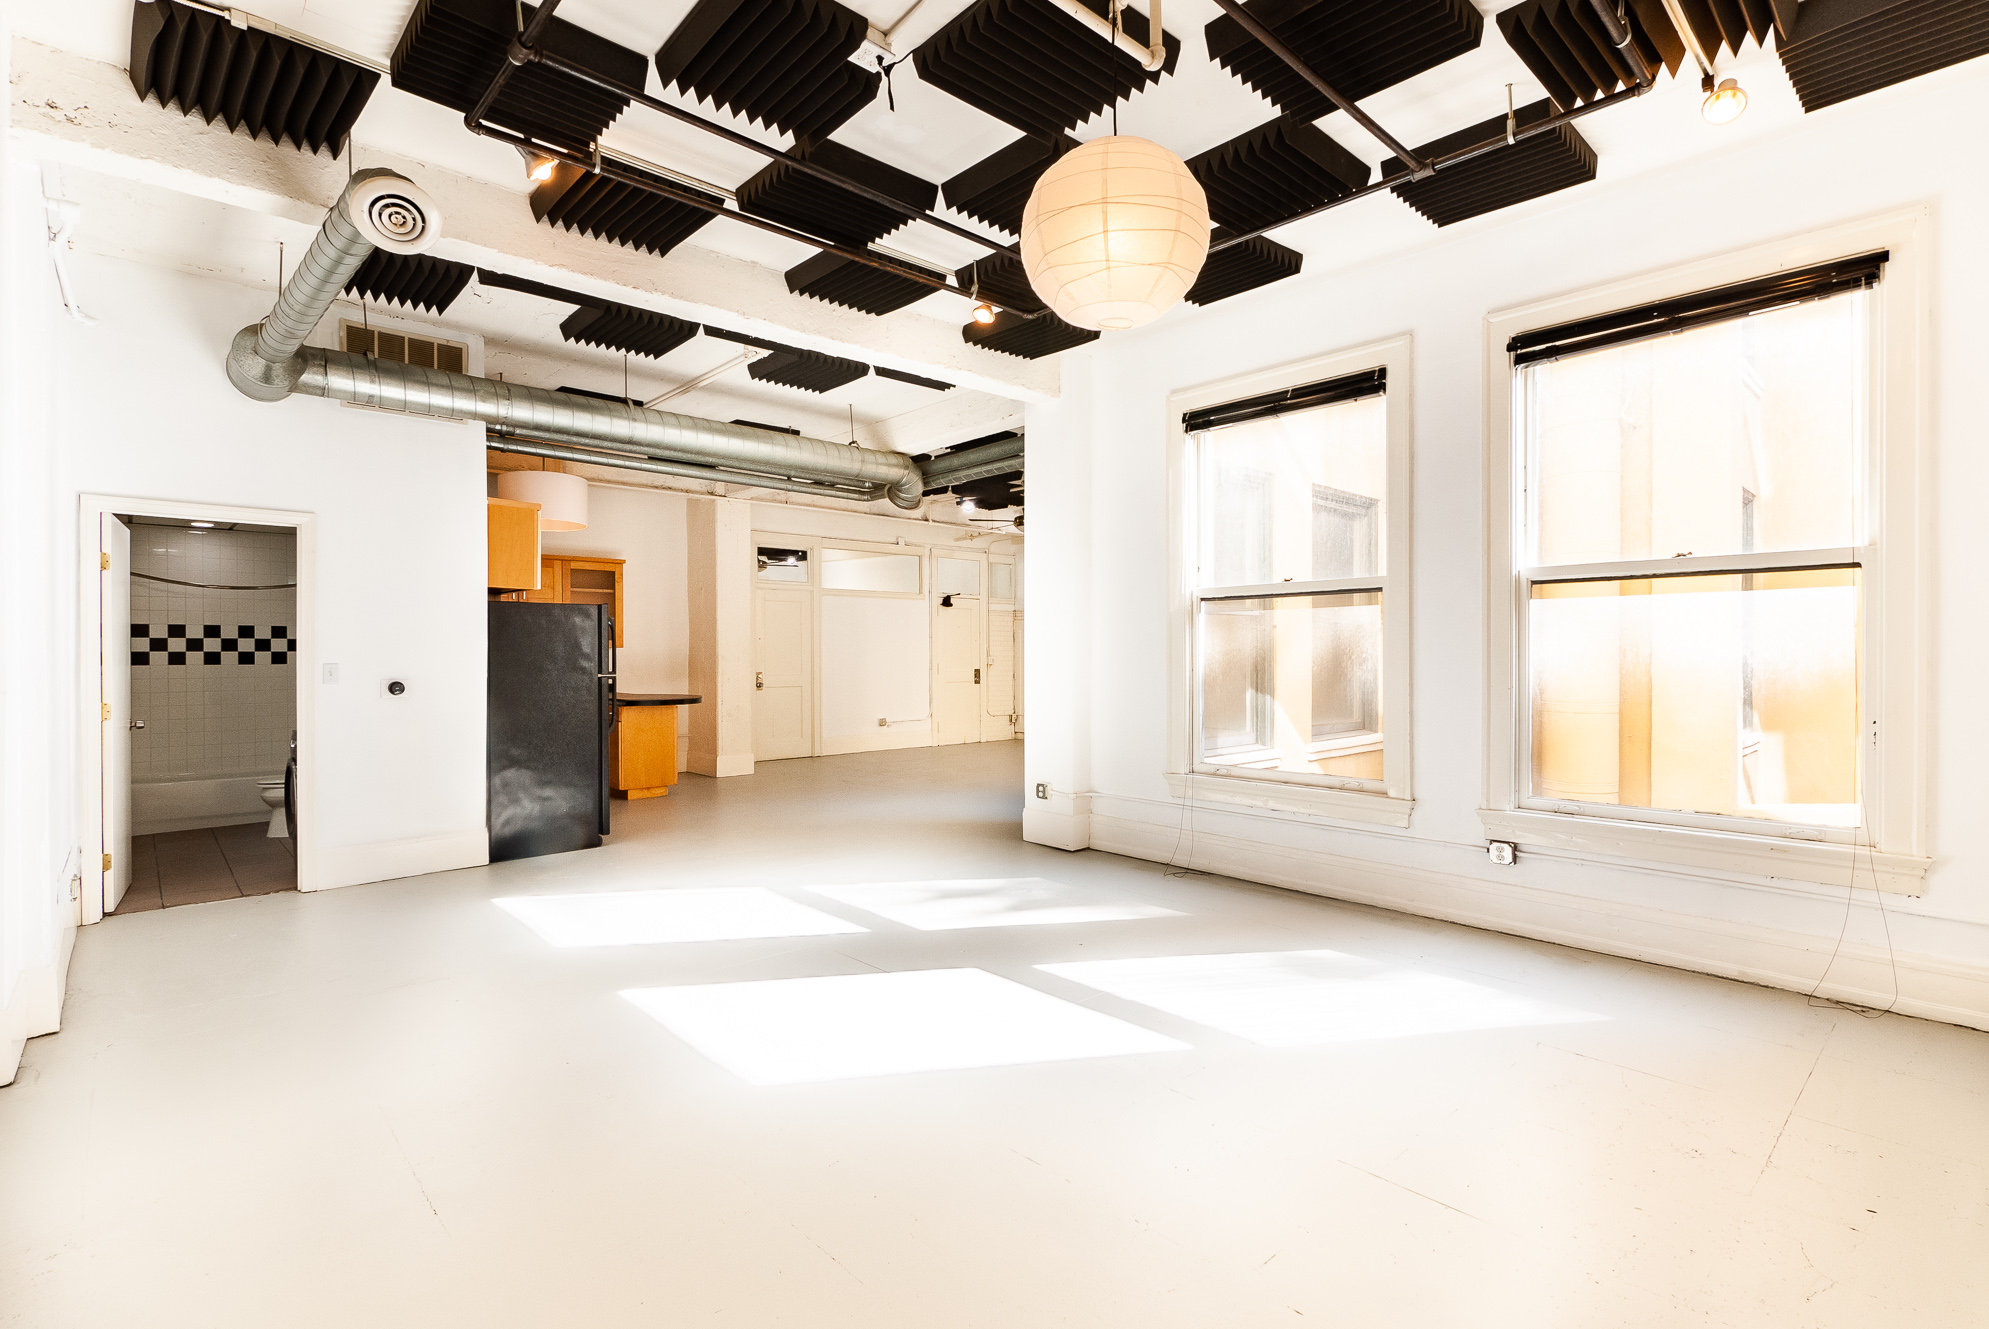 Industrial Higgins Loft | Interior Unit| Central AC/Heat | Rooftop W/ Views!